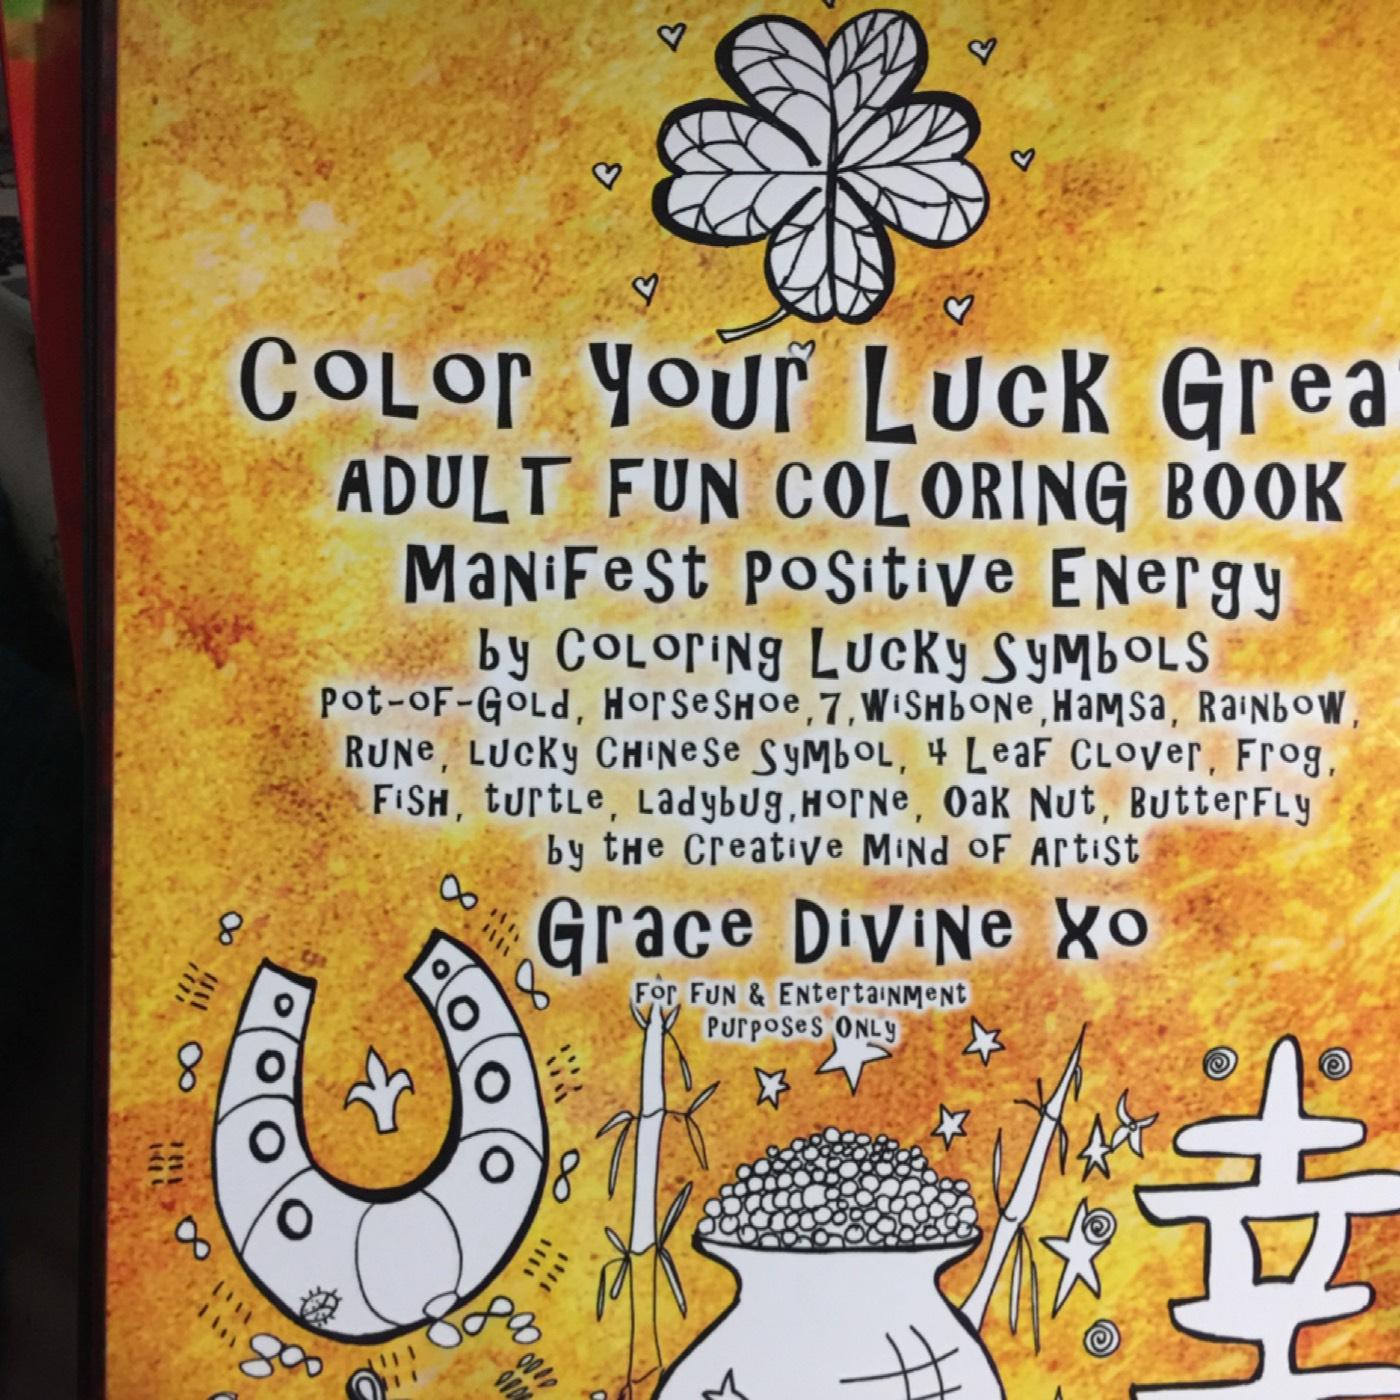 Divine Grace coloring #18, Download drawings